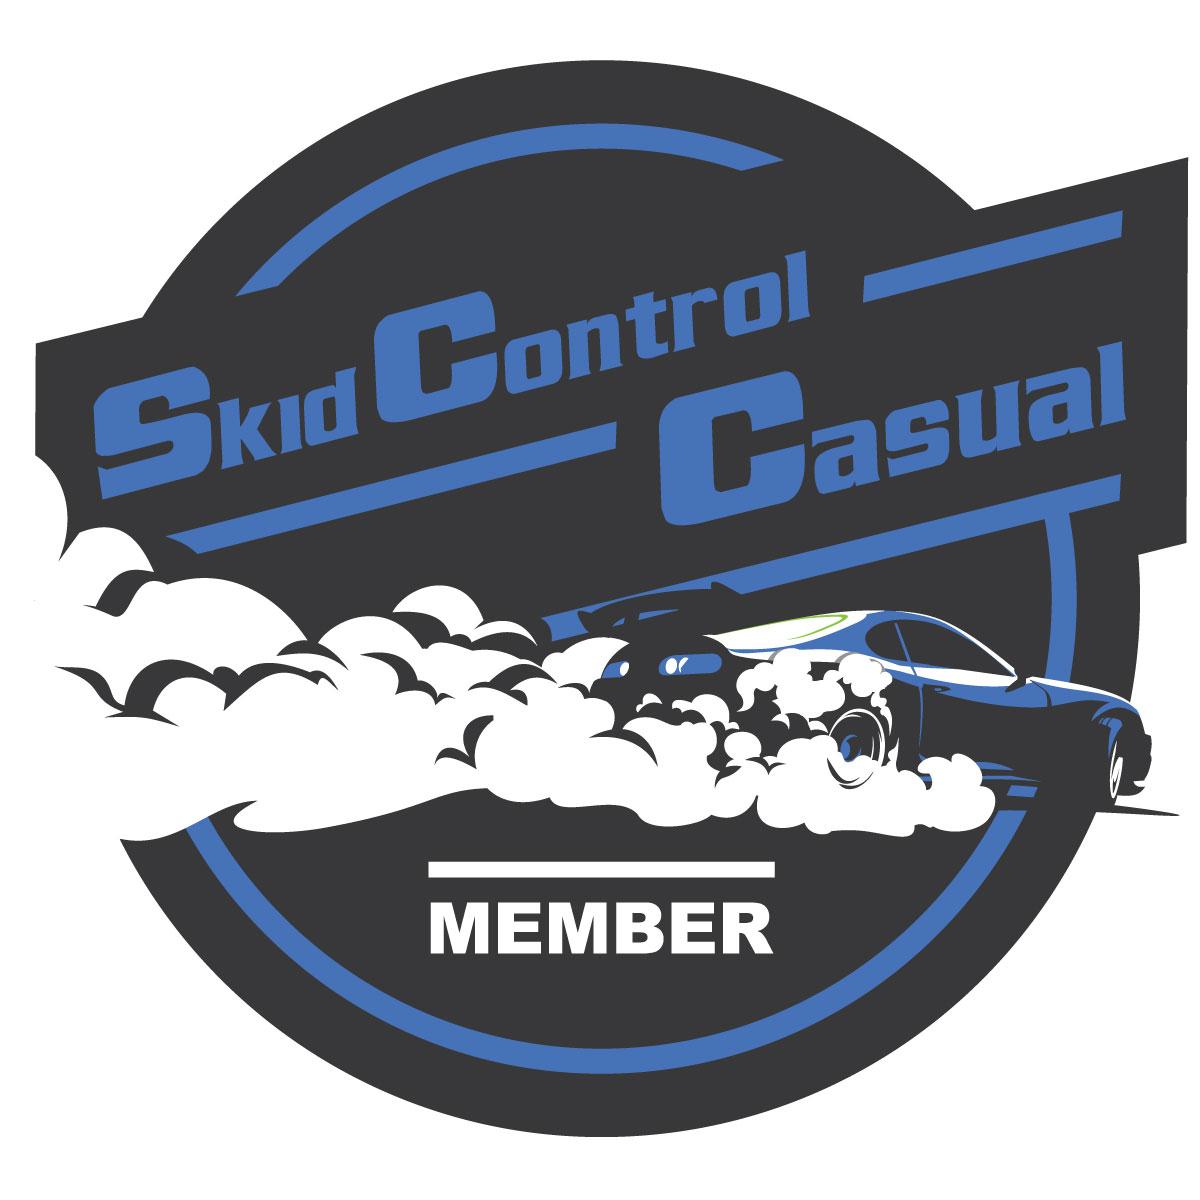 Skid Control Casual